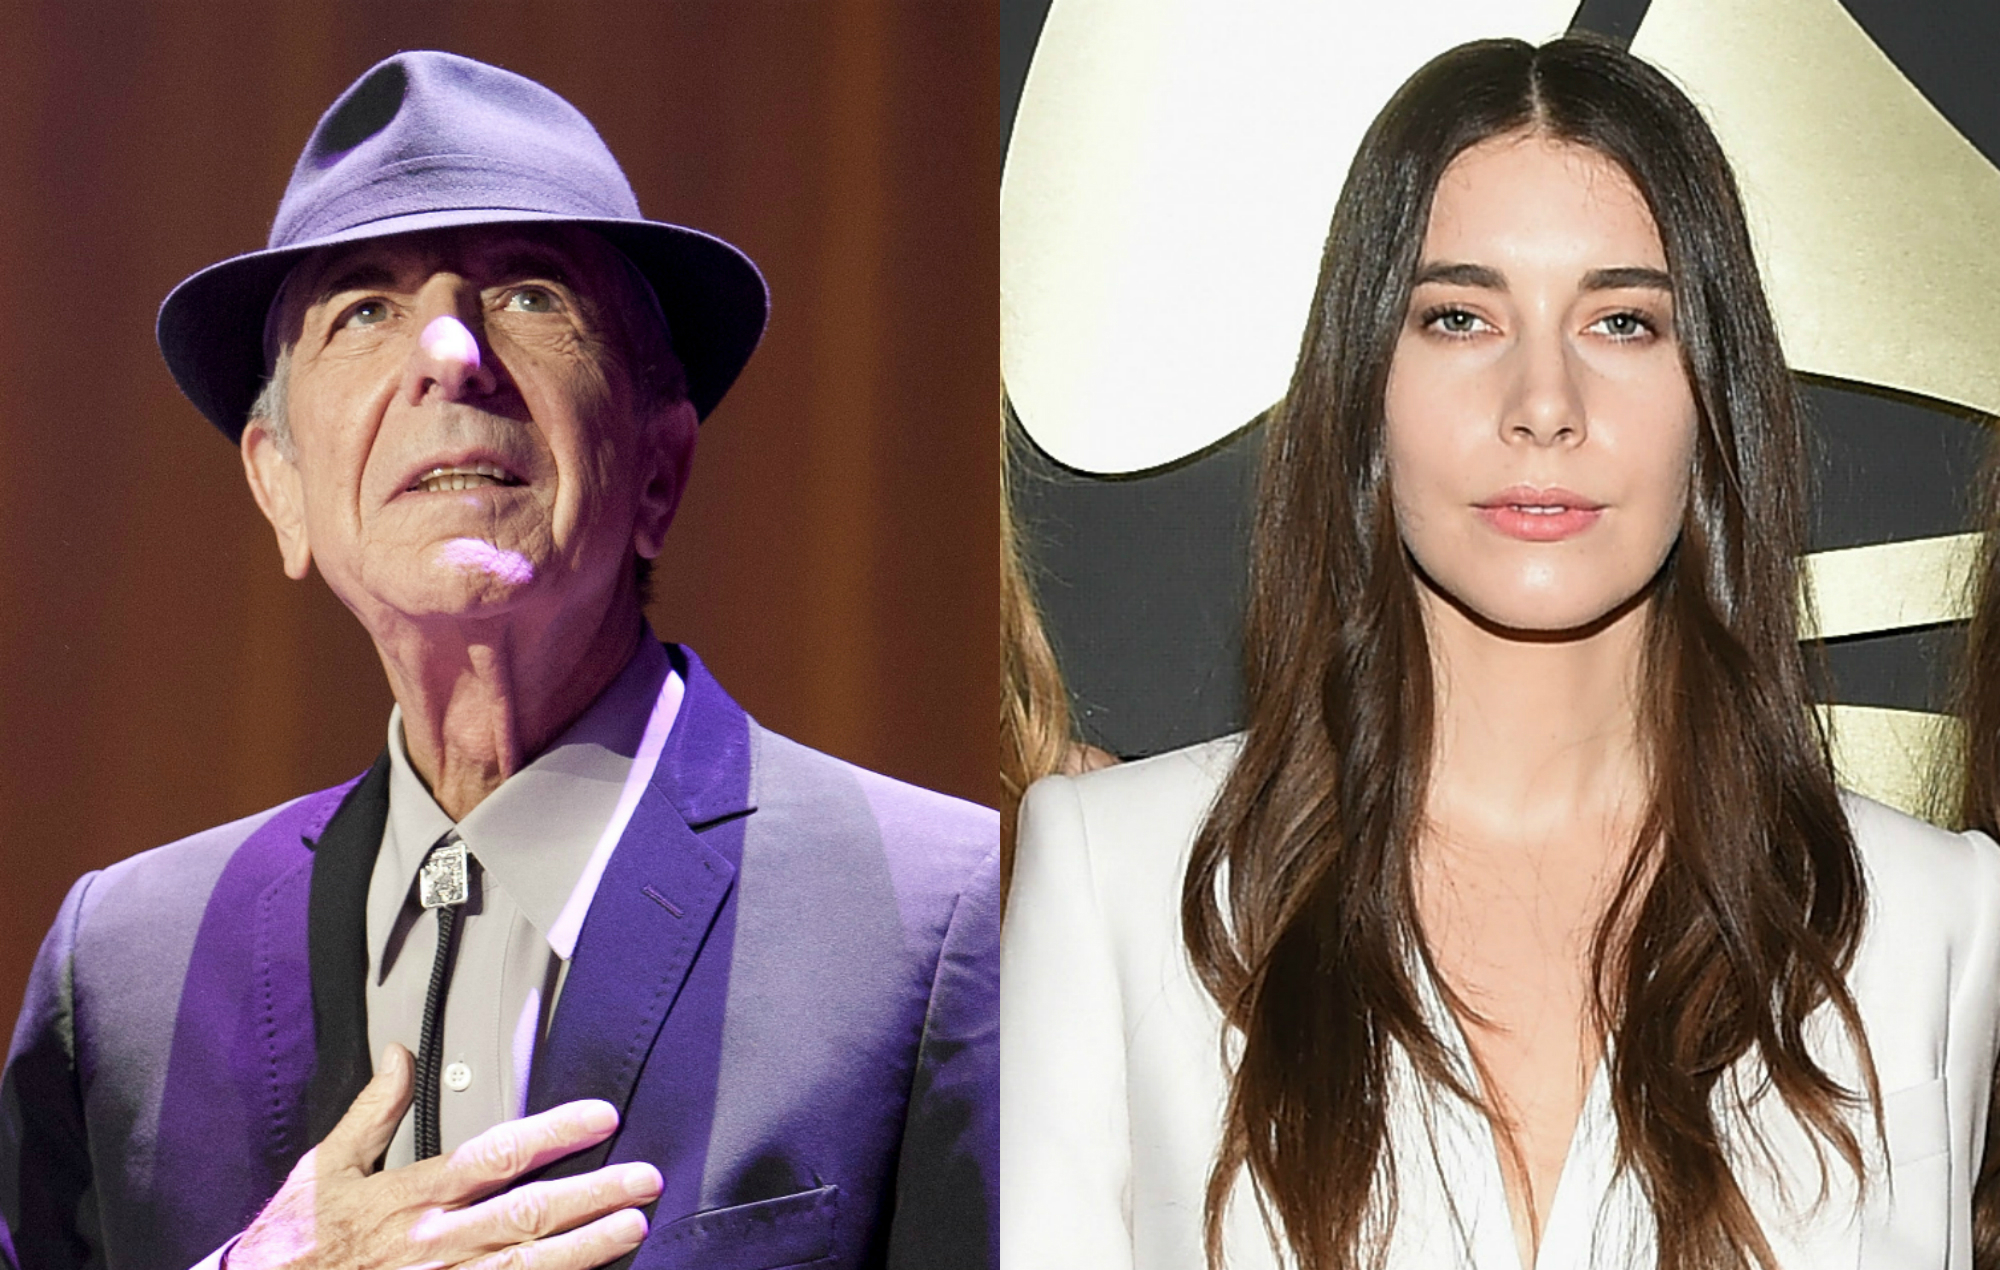 Leonard Cohen and Danielle Haim